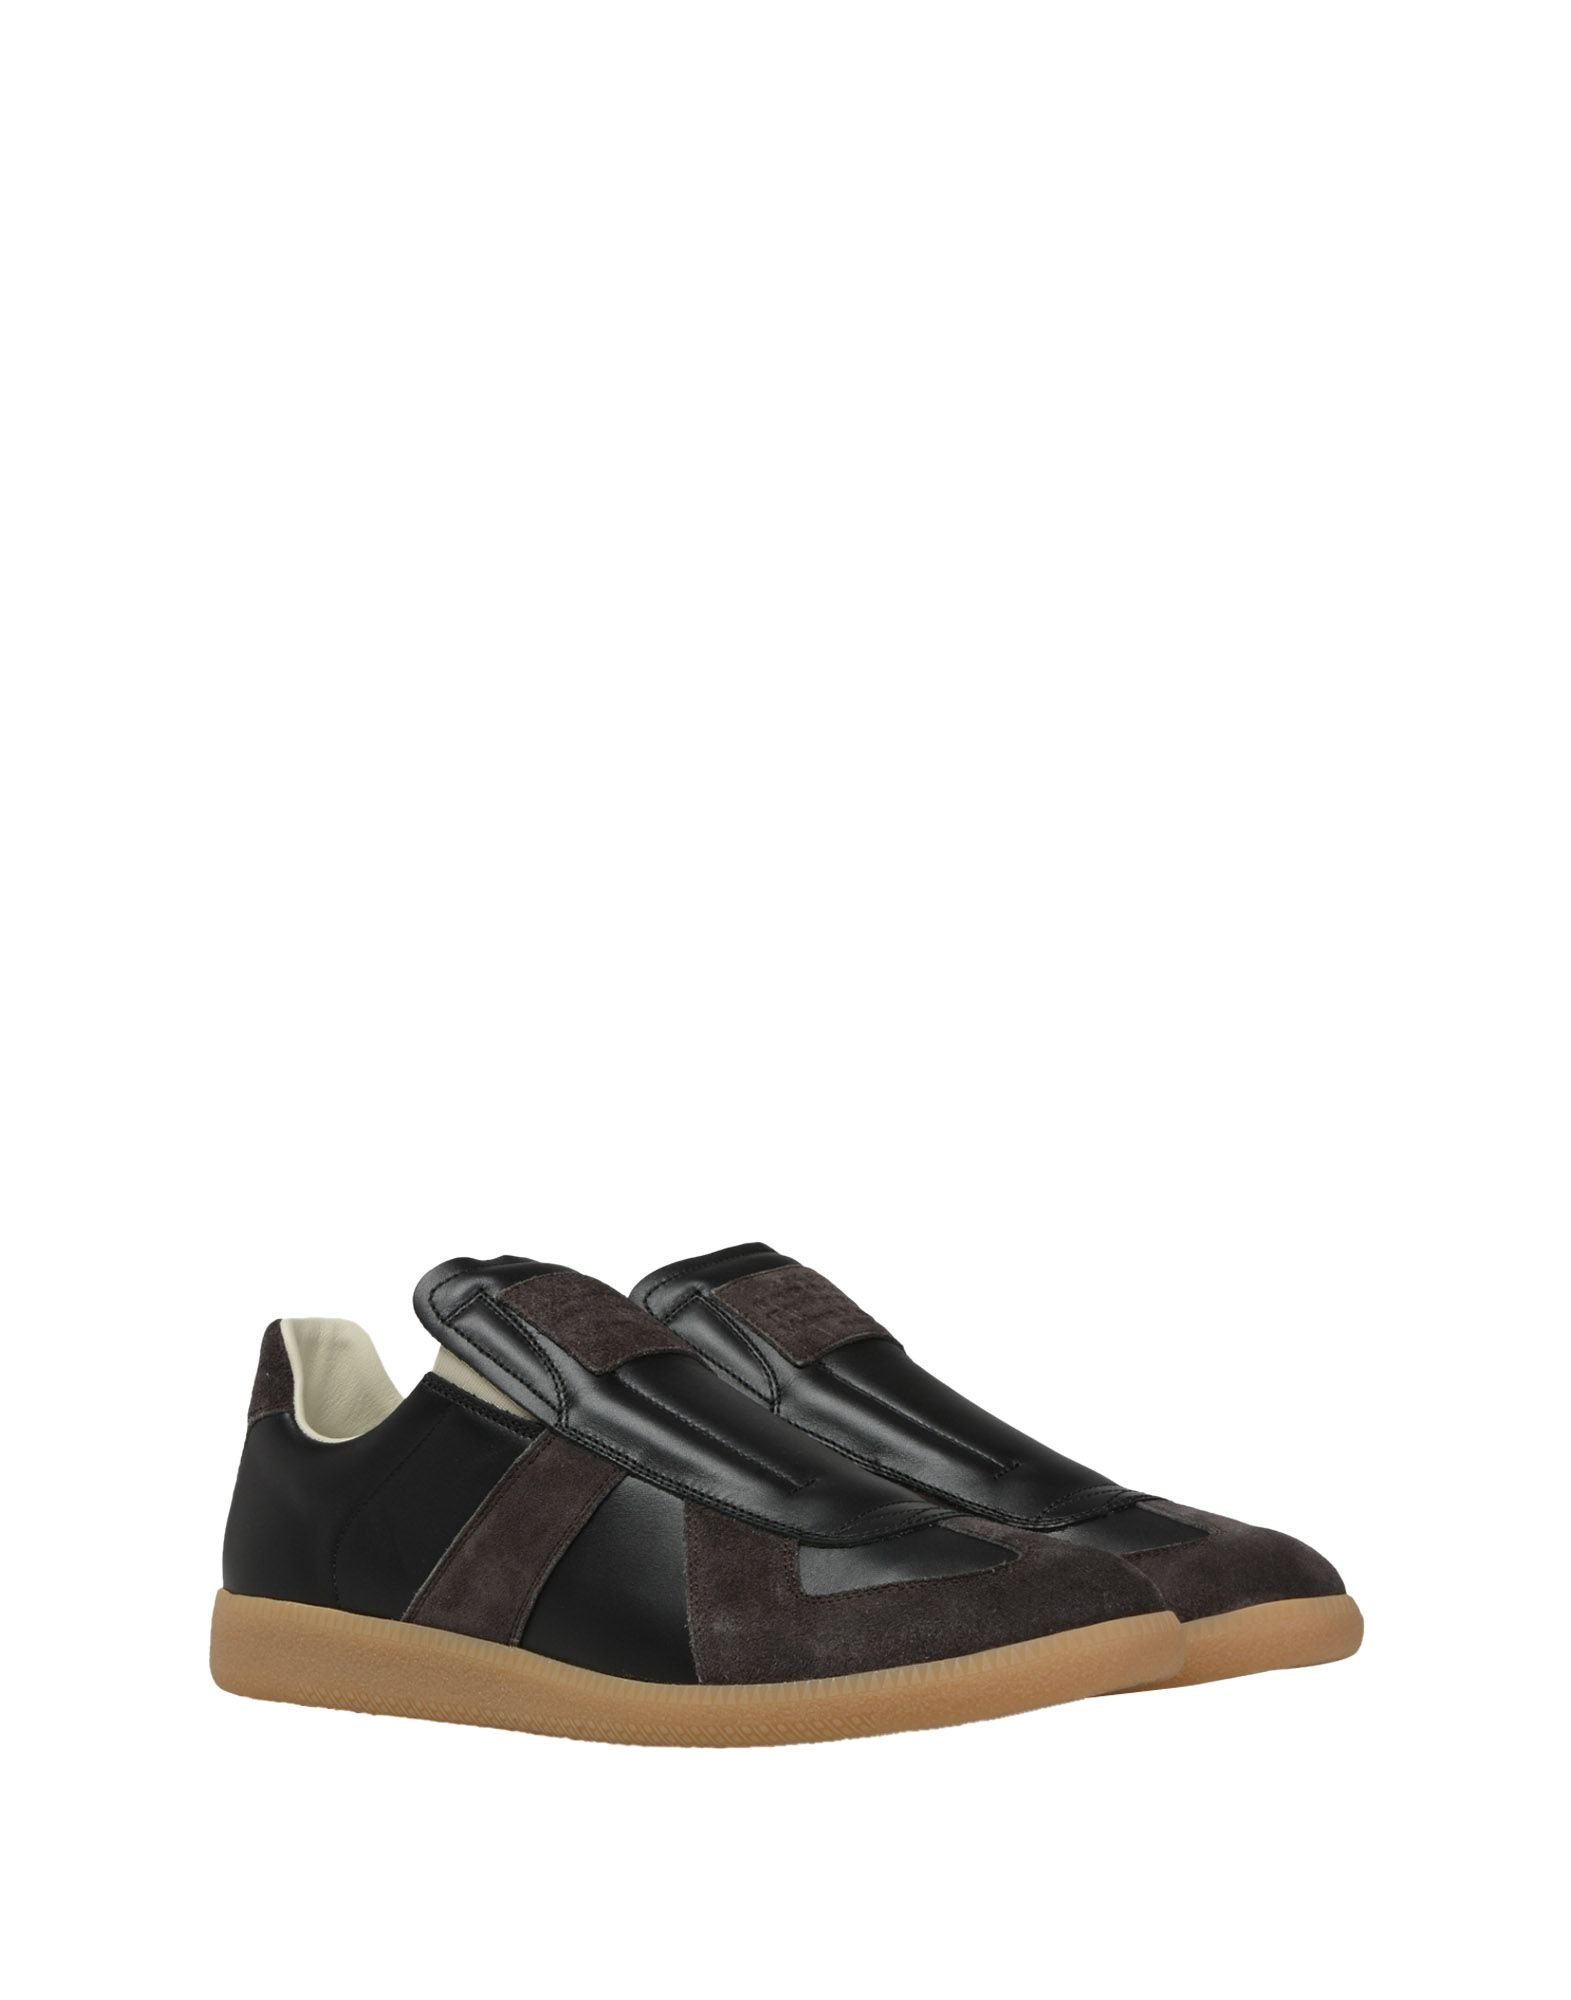 Maison Margiela Sneakers Herren  11343468XE Gute Qualität beliebte Schuhe